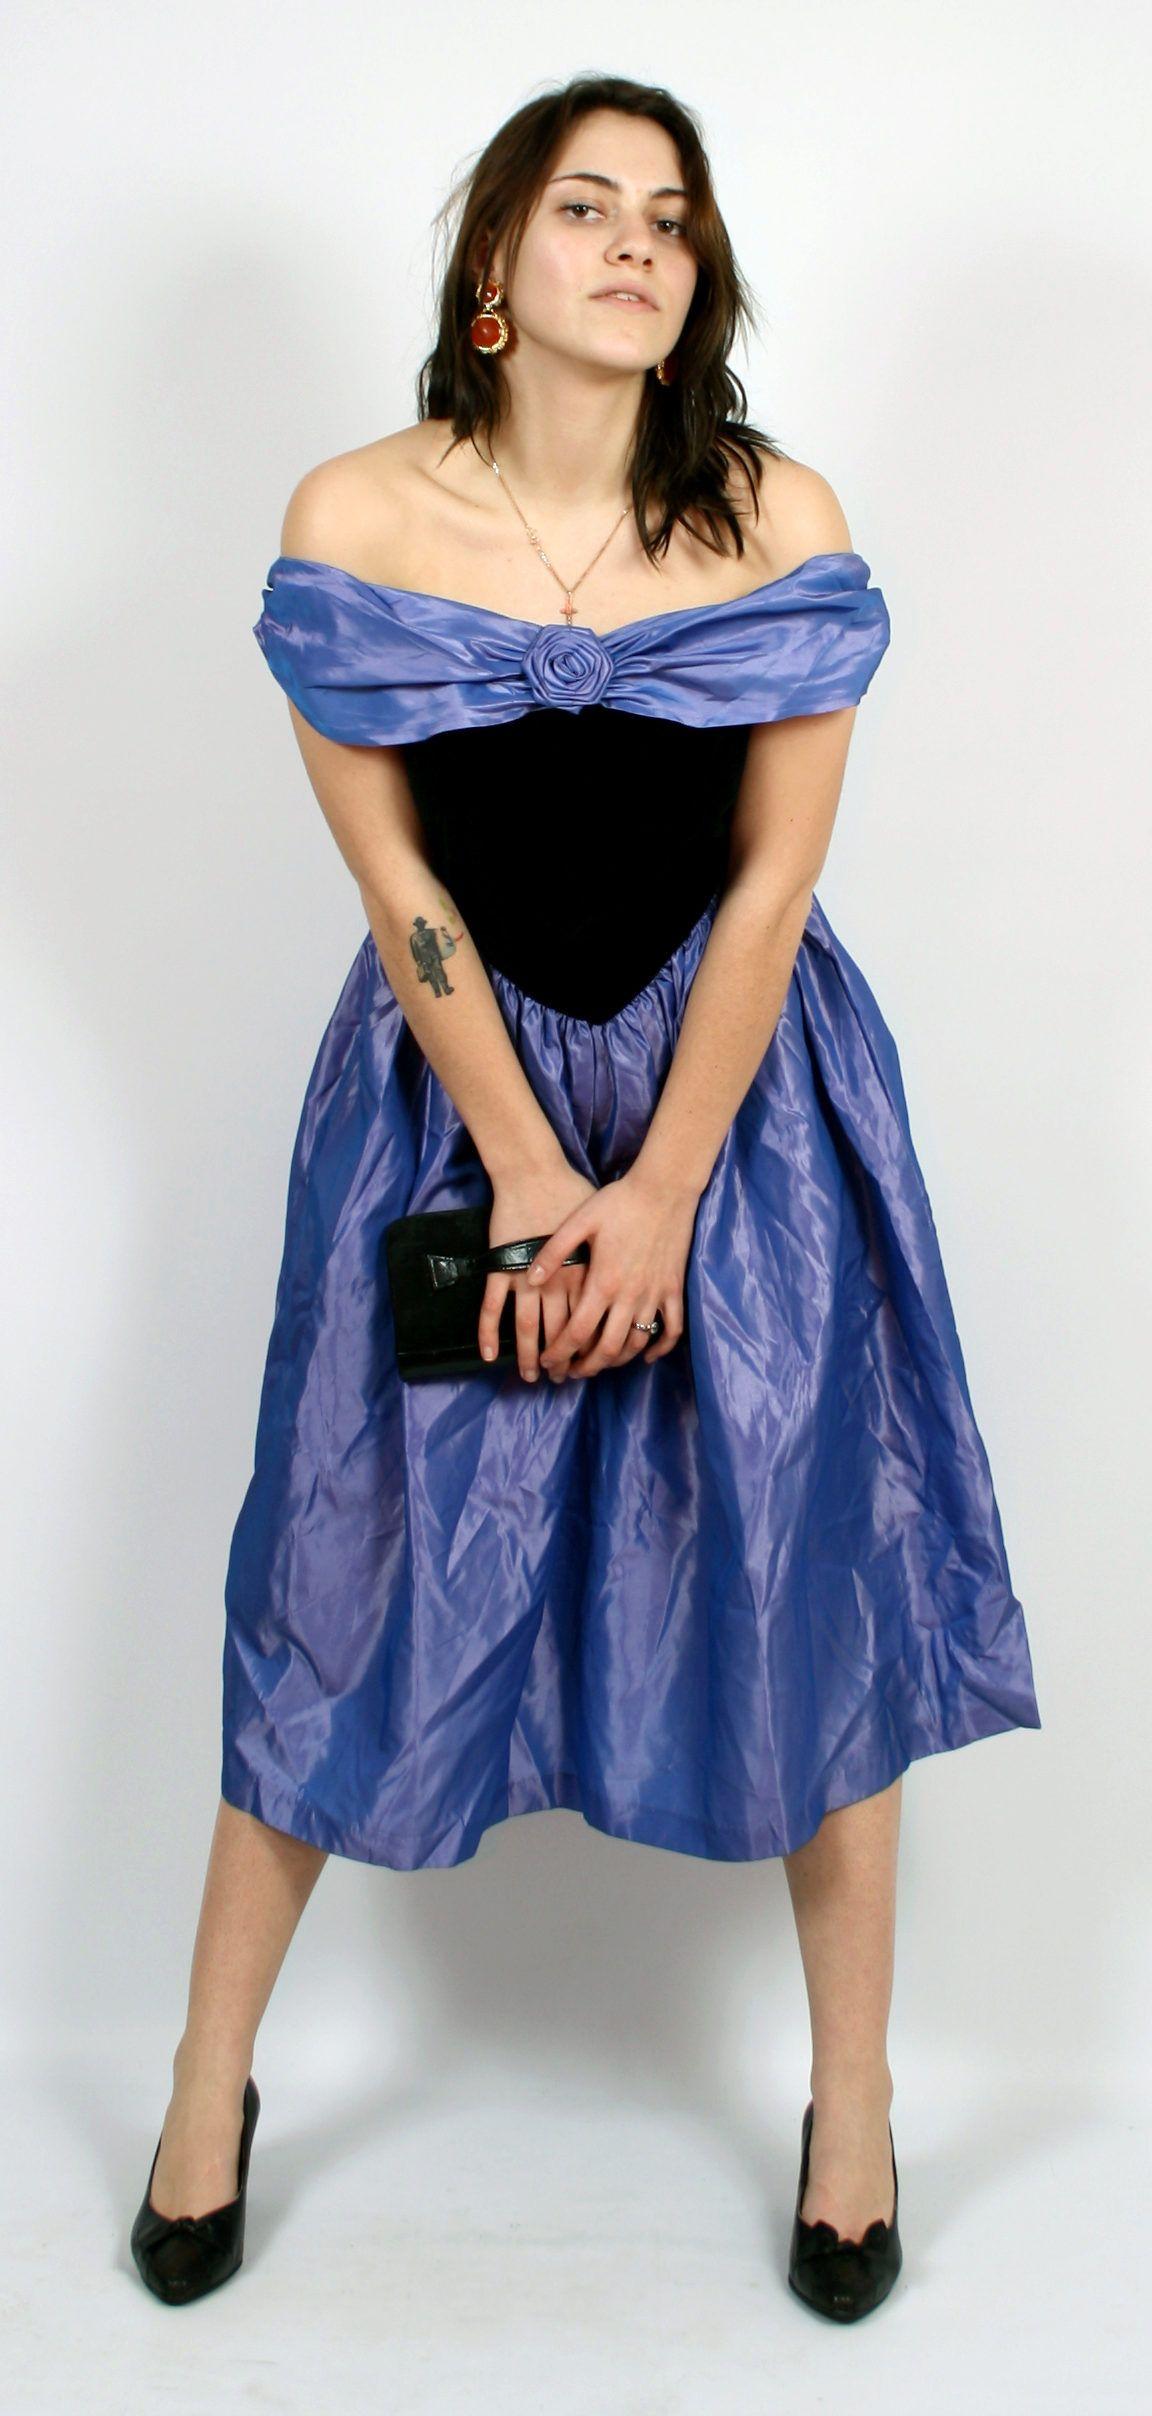 Pin von Rita Green auf Taffeta | Pinterest